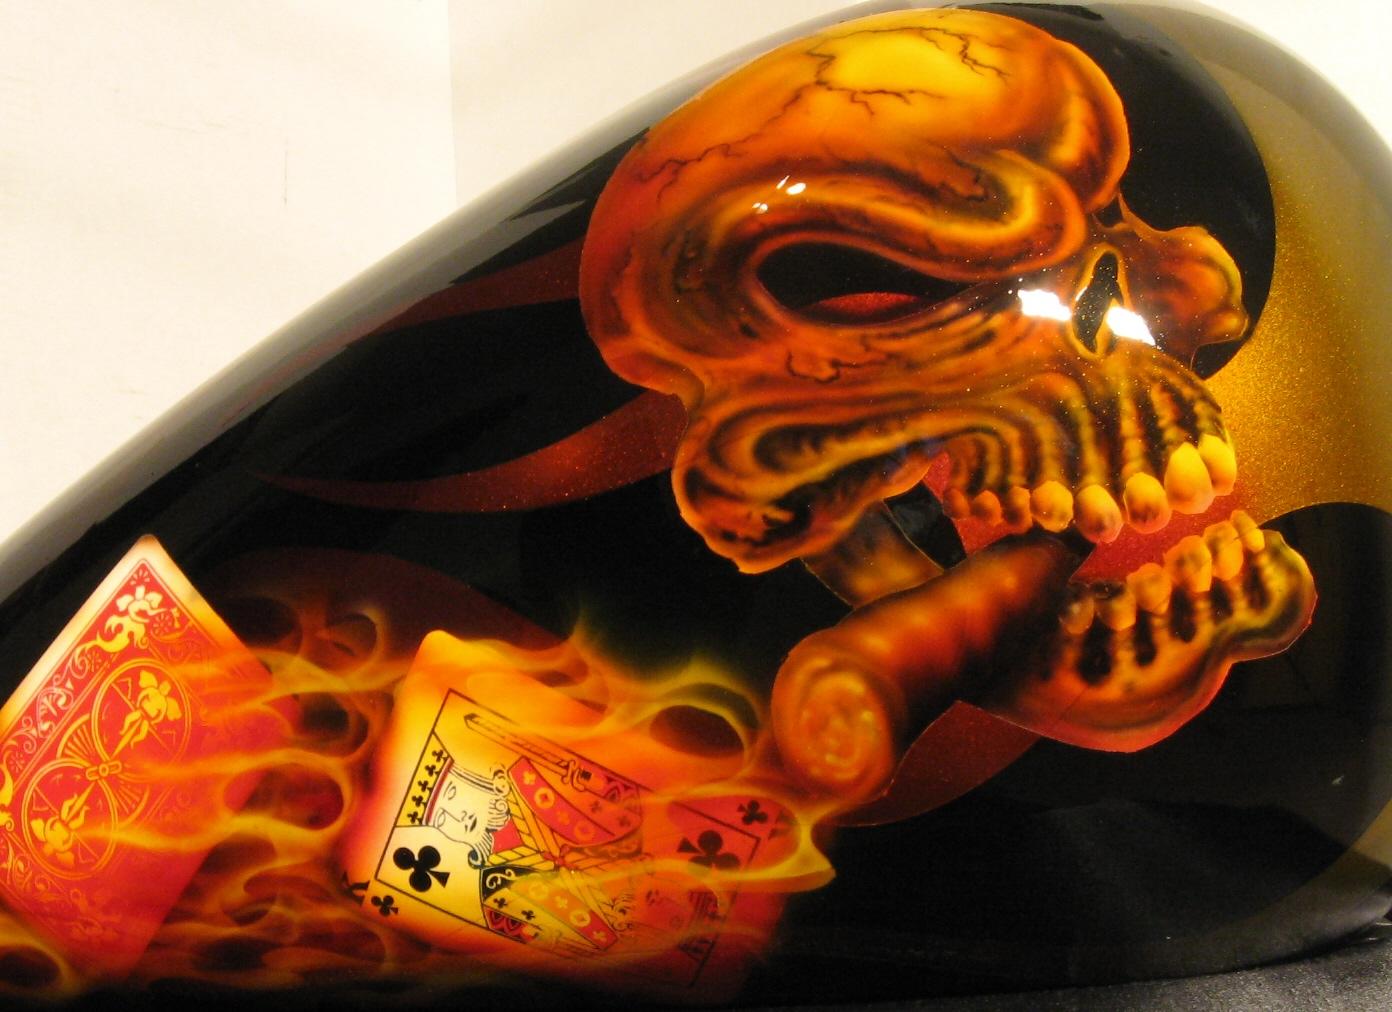 Harley-Davidson-Cards-True-Flame-Cards-Skull-Cigar-Gas-Tank-Gastank-2